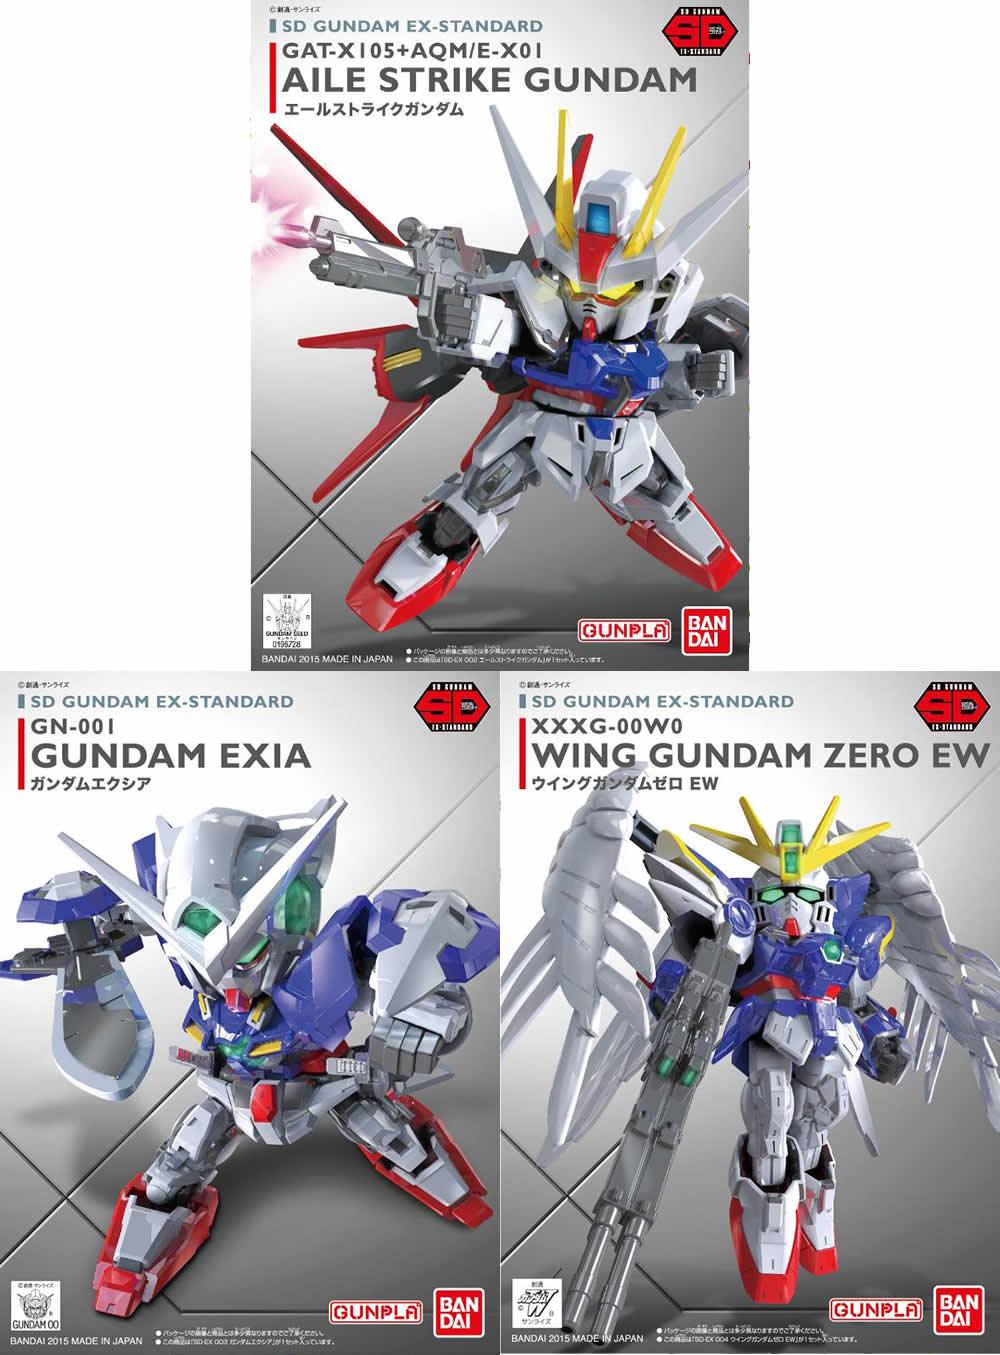 [3 in 1] SD Ex-Standard - Aile Strike, Wing Zero EW, Exia